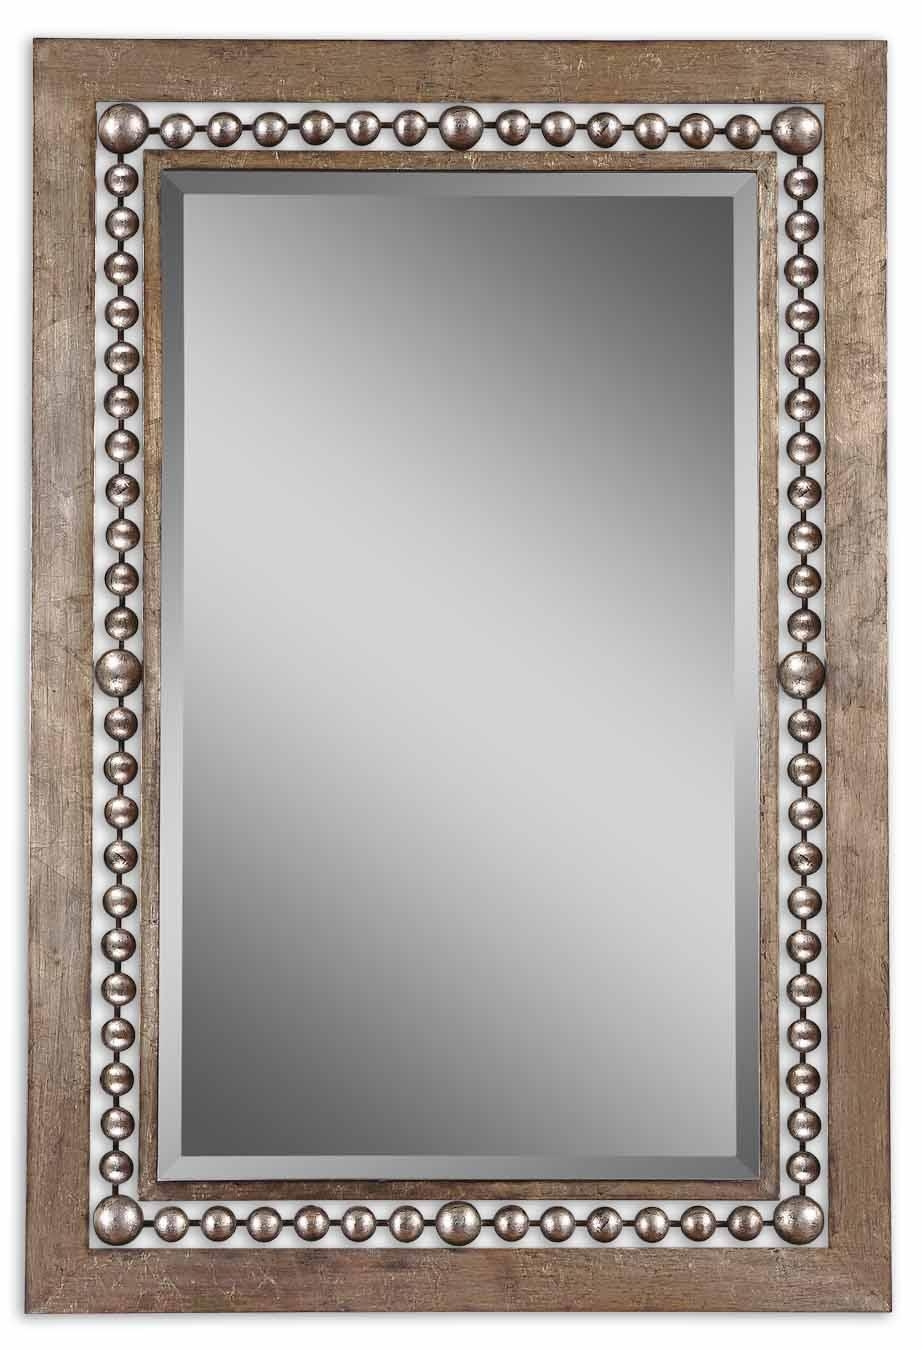 Uttermost Fidda Antique Silver Mirror 13724 With Regard To Antique Silver Mirror (Image 19 of 20)